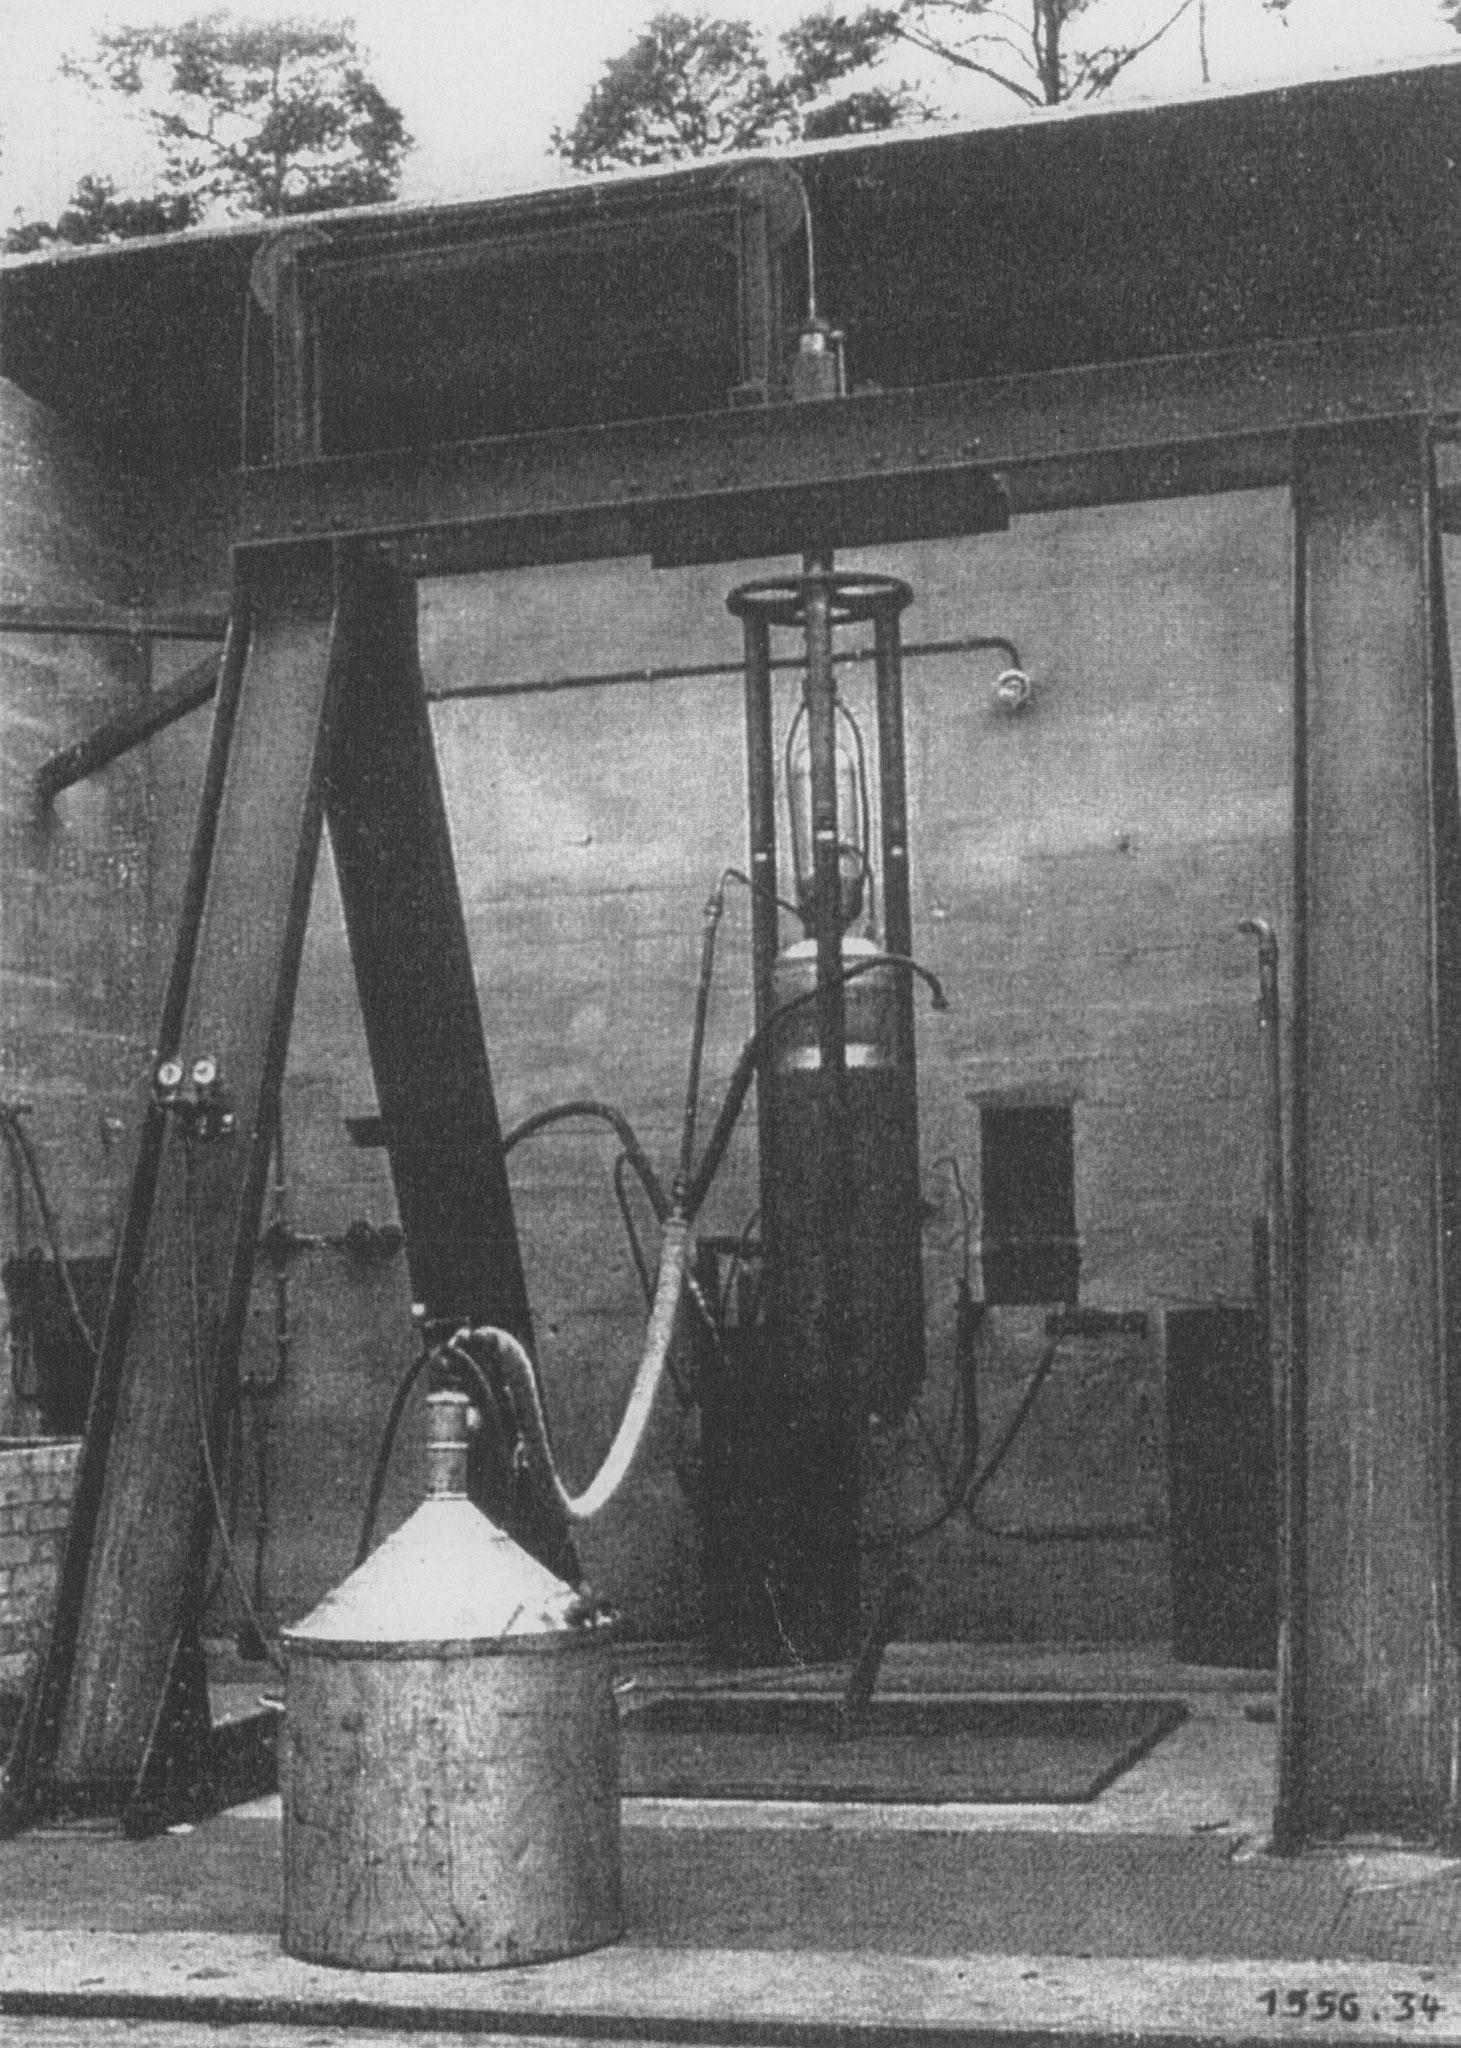 Liquid propellant engine on the test rig, circa 1930 (© Förderverein Museum Kummersdorf e. V.)